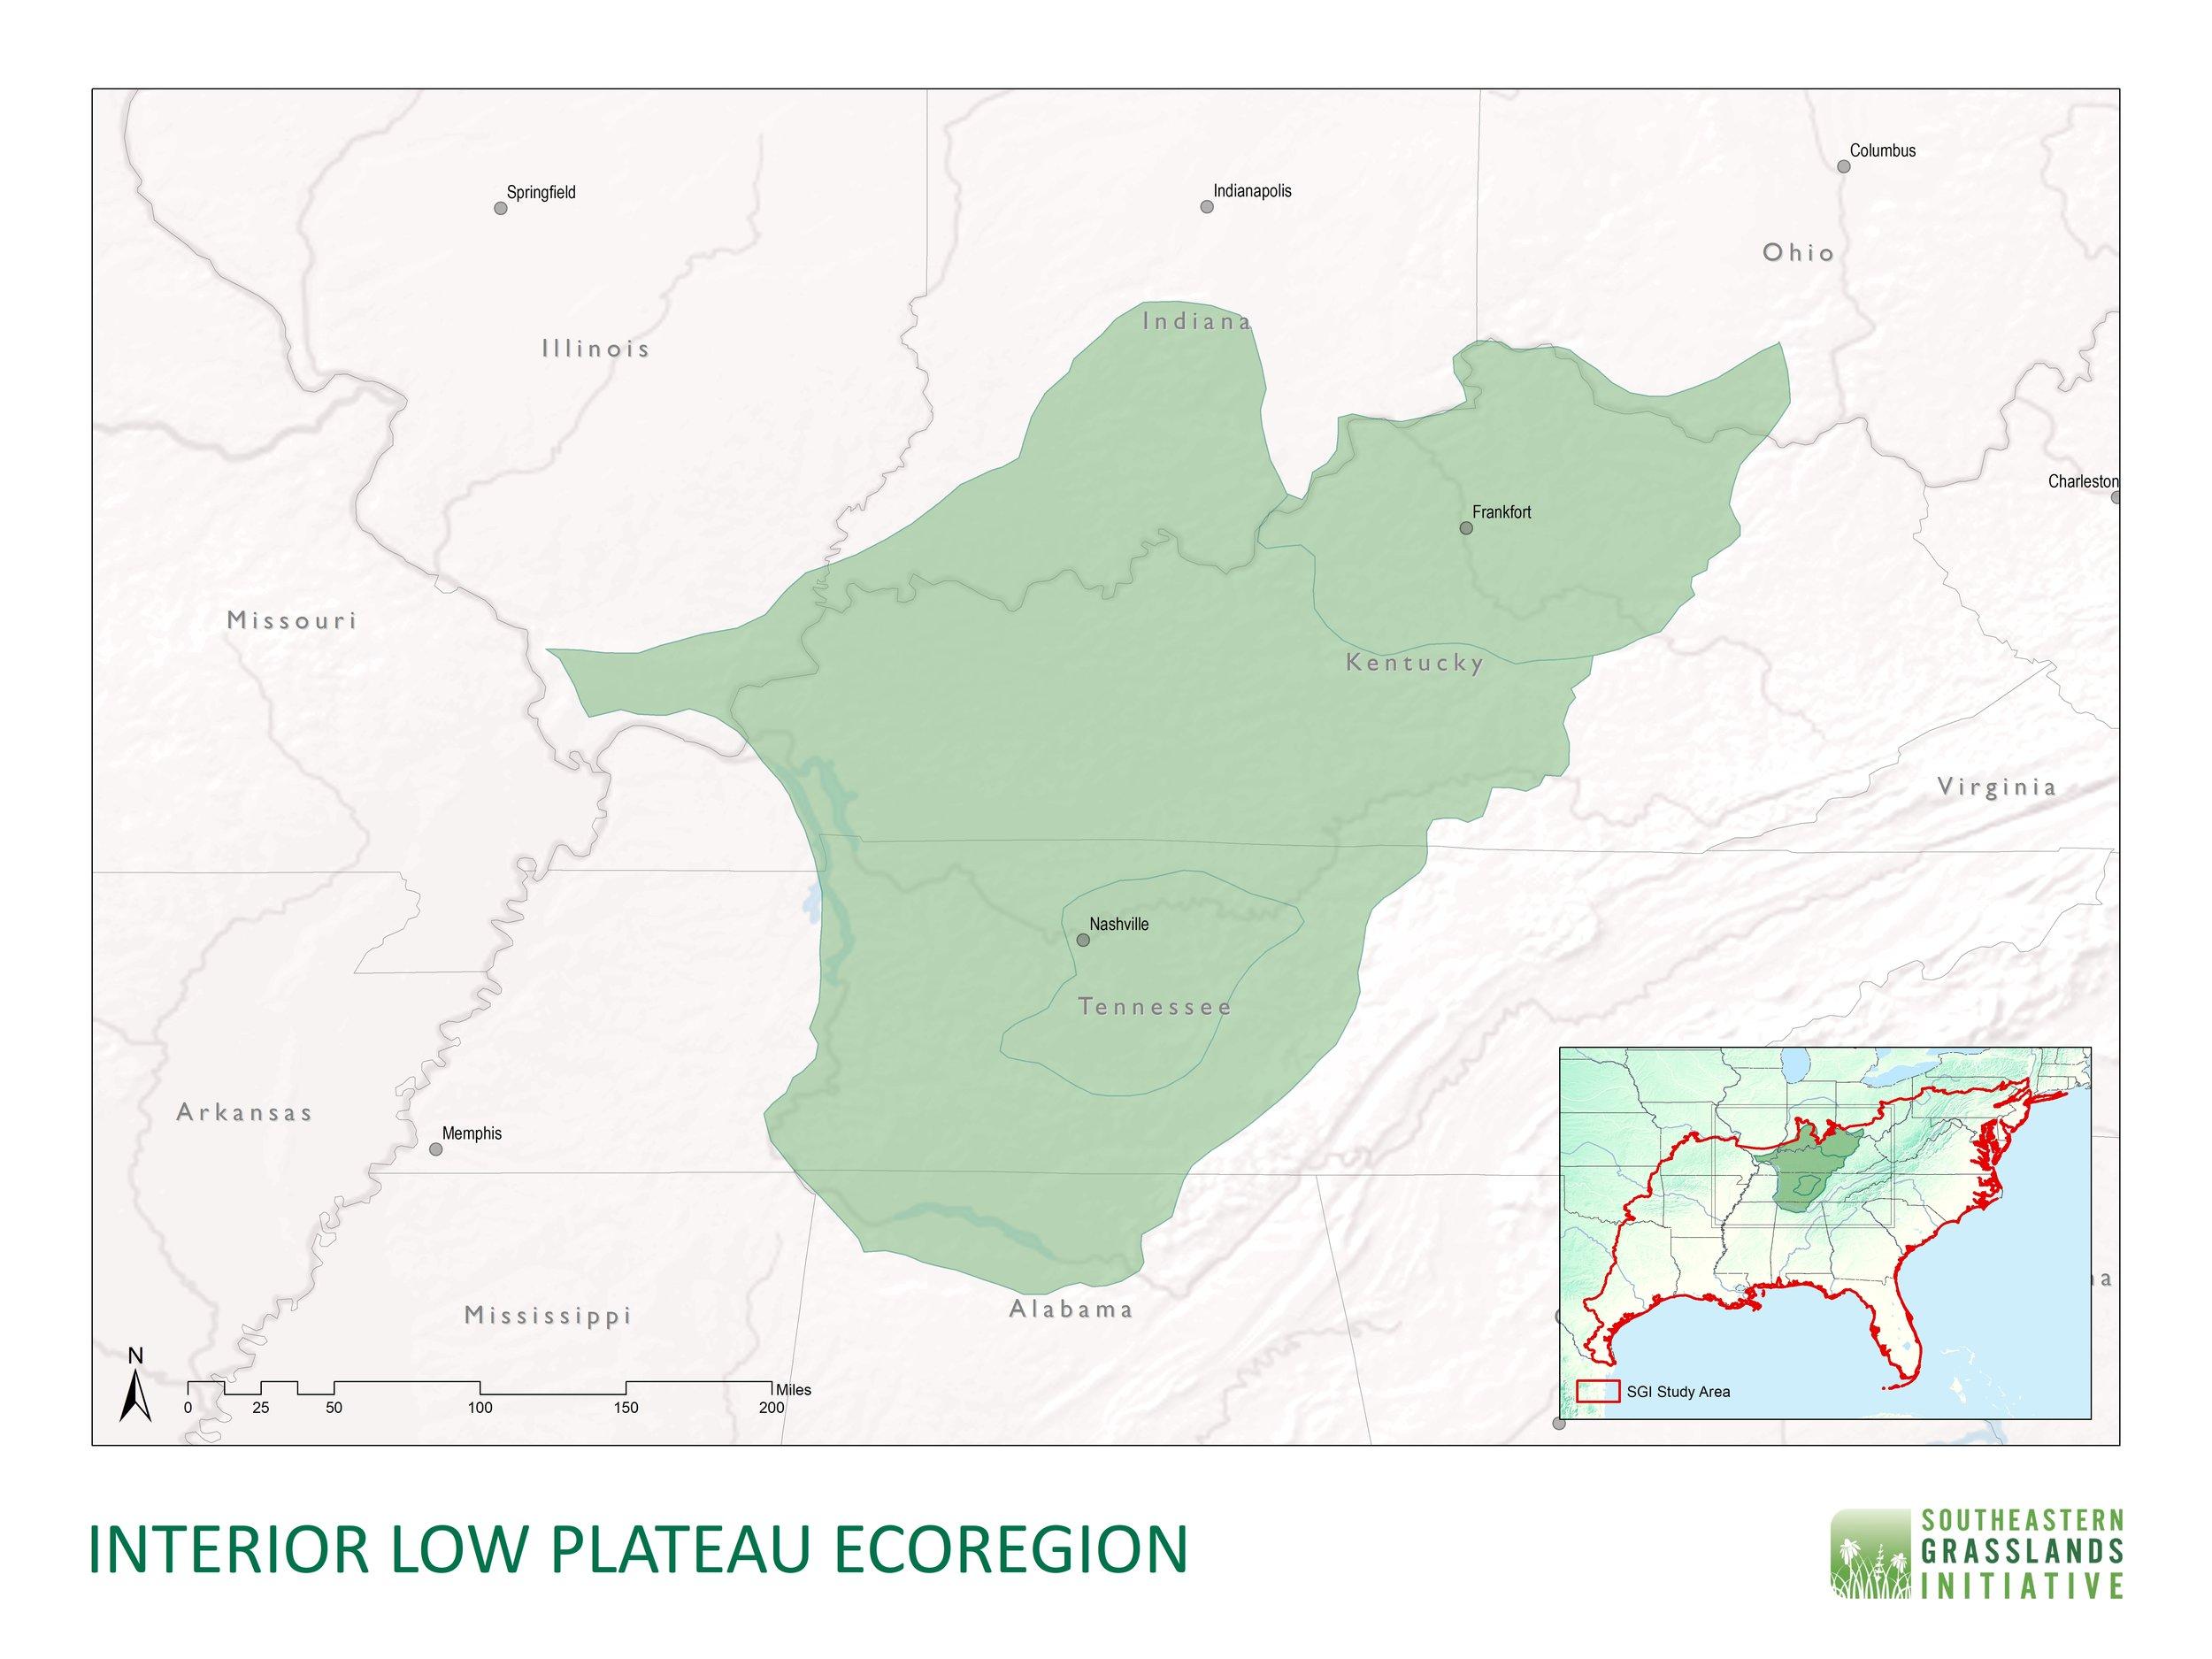 Interior Low Plateau